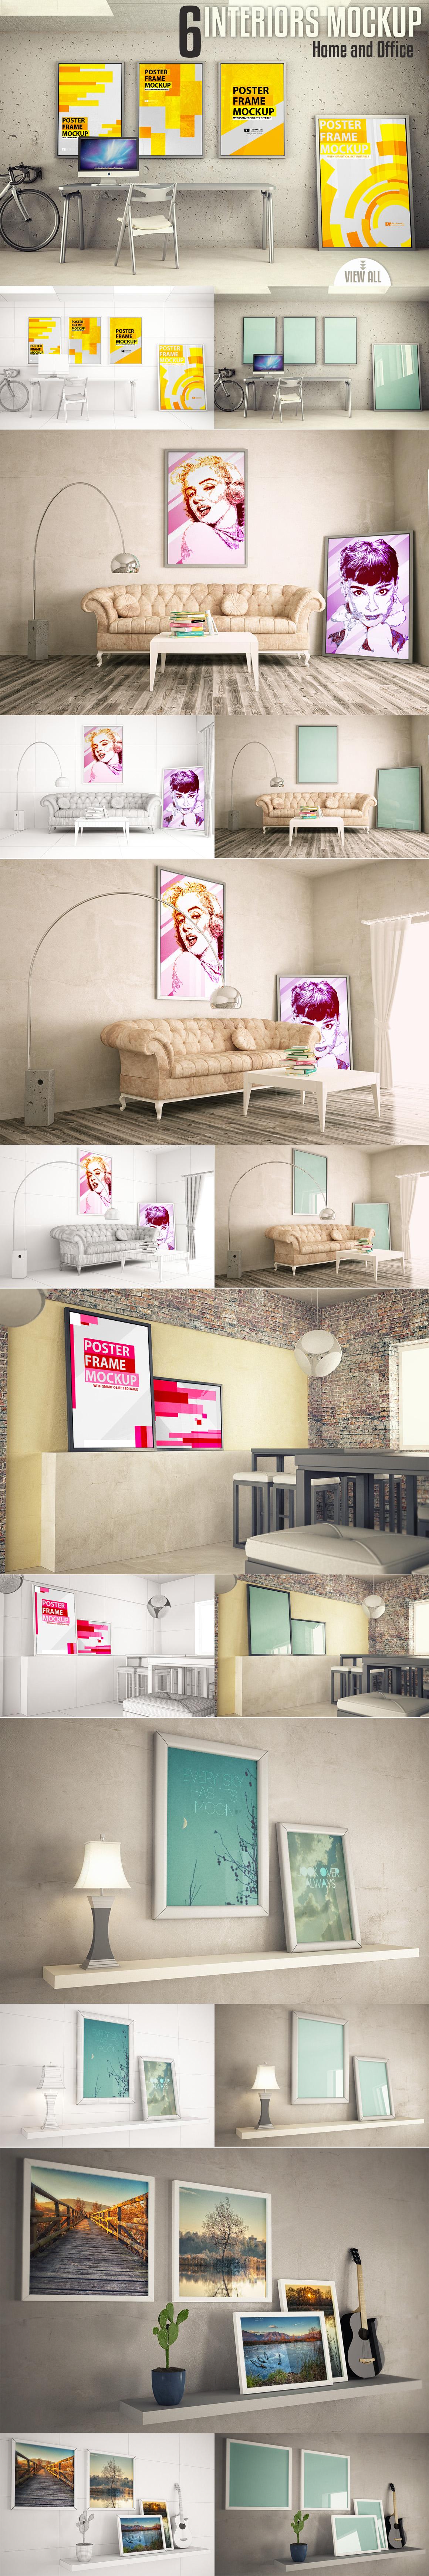 Interiors mock-up Vol. 2 example image 3